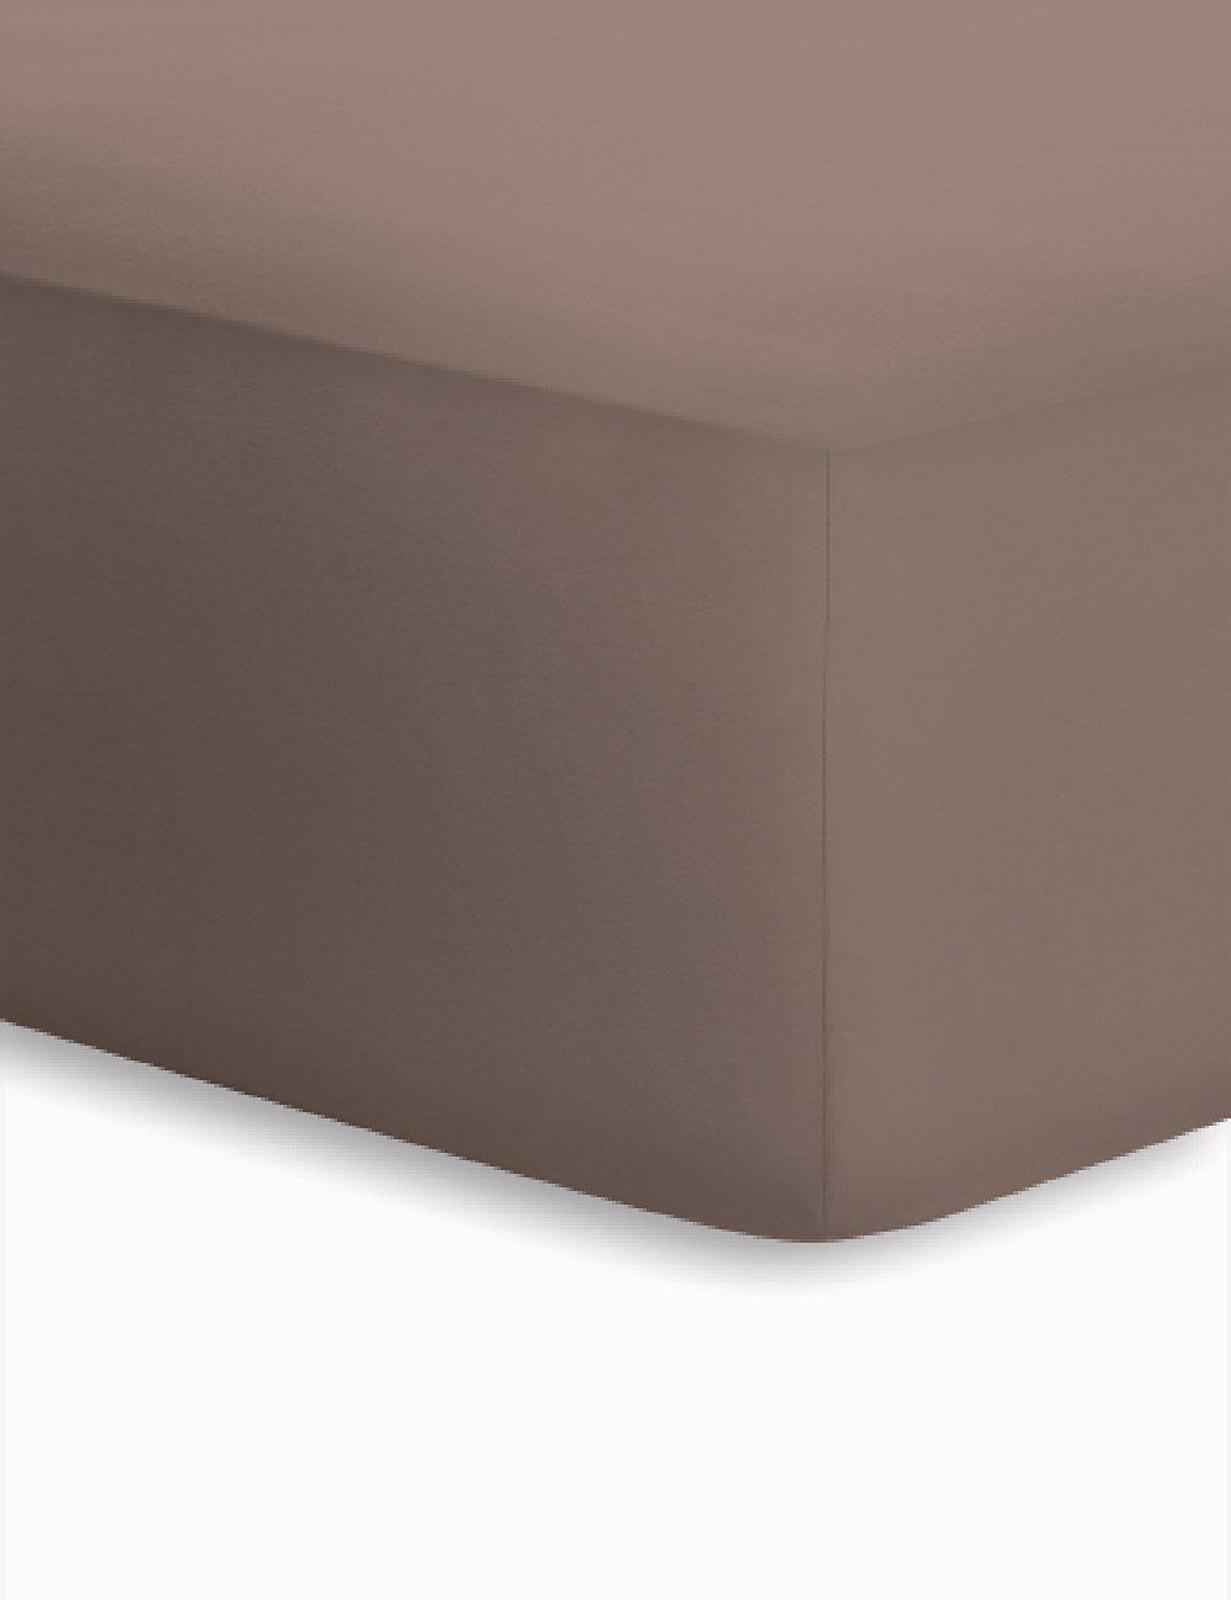 schlafgut jersey elasthan boxspring online entdecken schaffrath ihr m belhaus. Black Bedroom Furniture Sets. Home Design Ideas